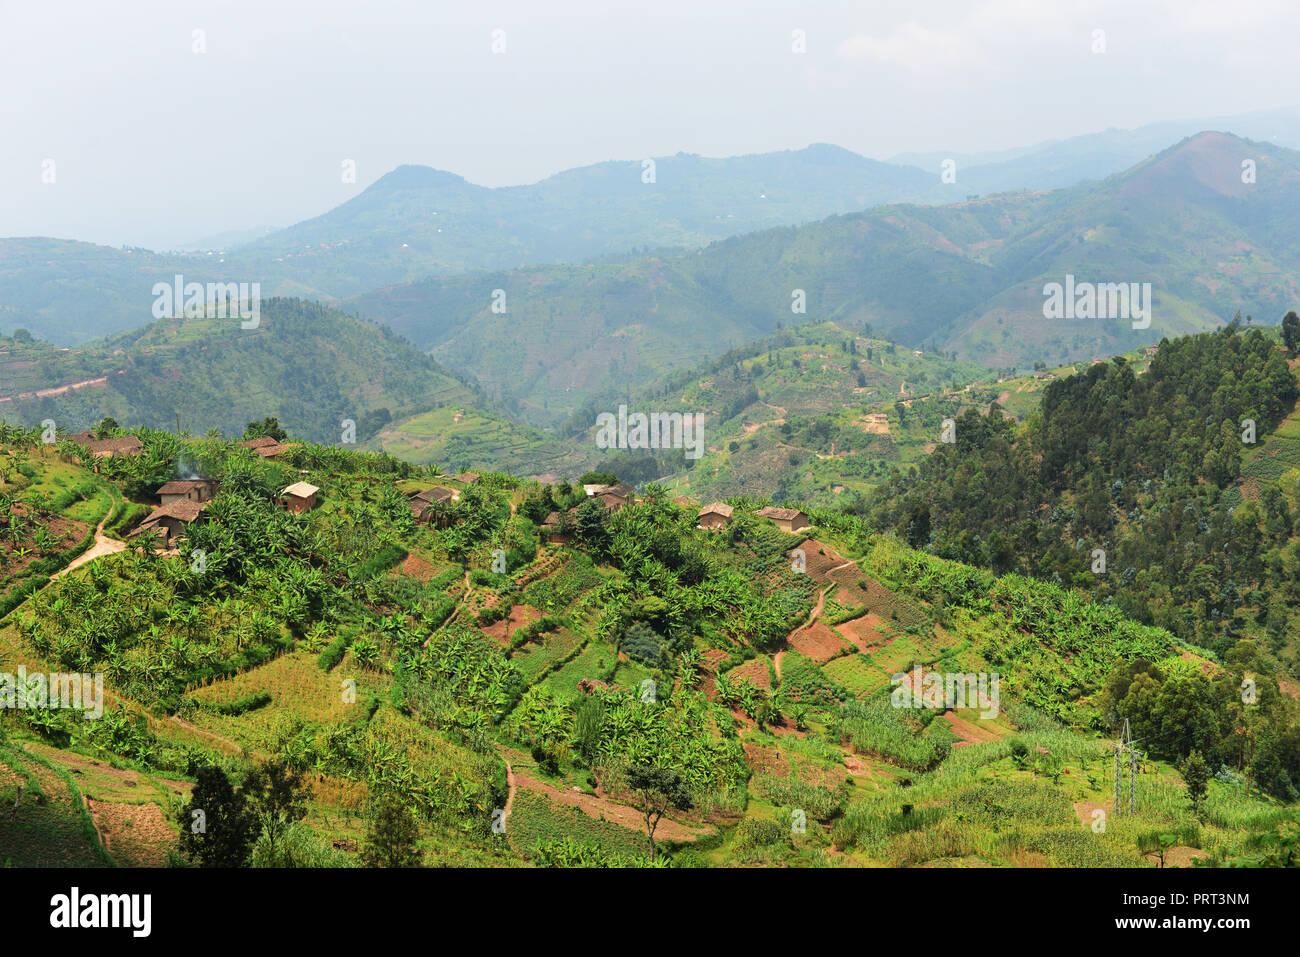 Rural landscapes in western Rwanda. - Stock Image